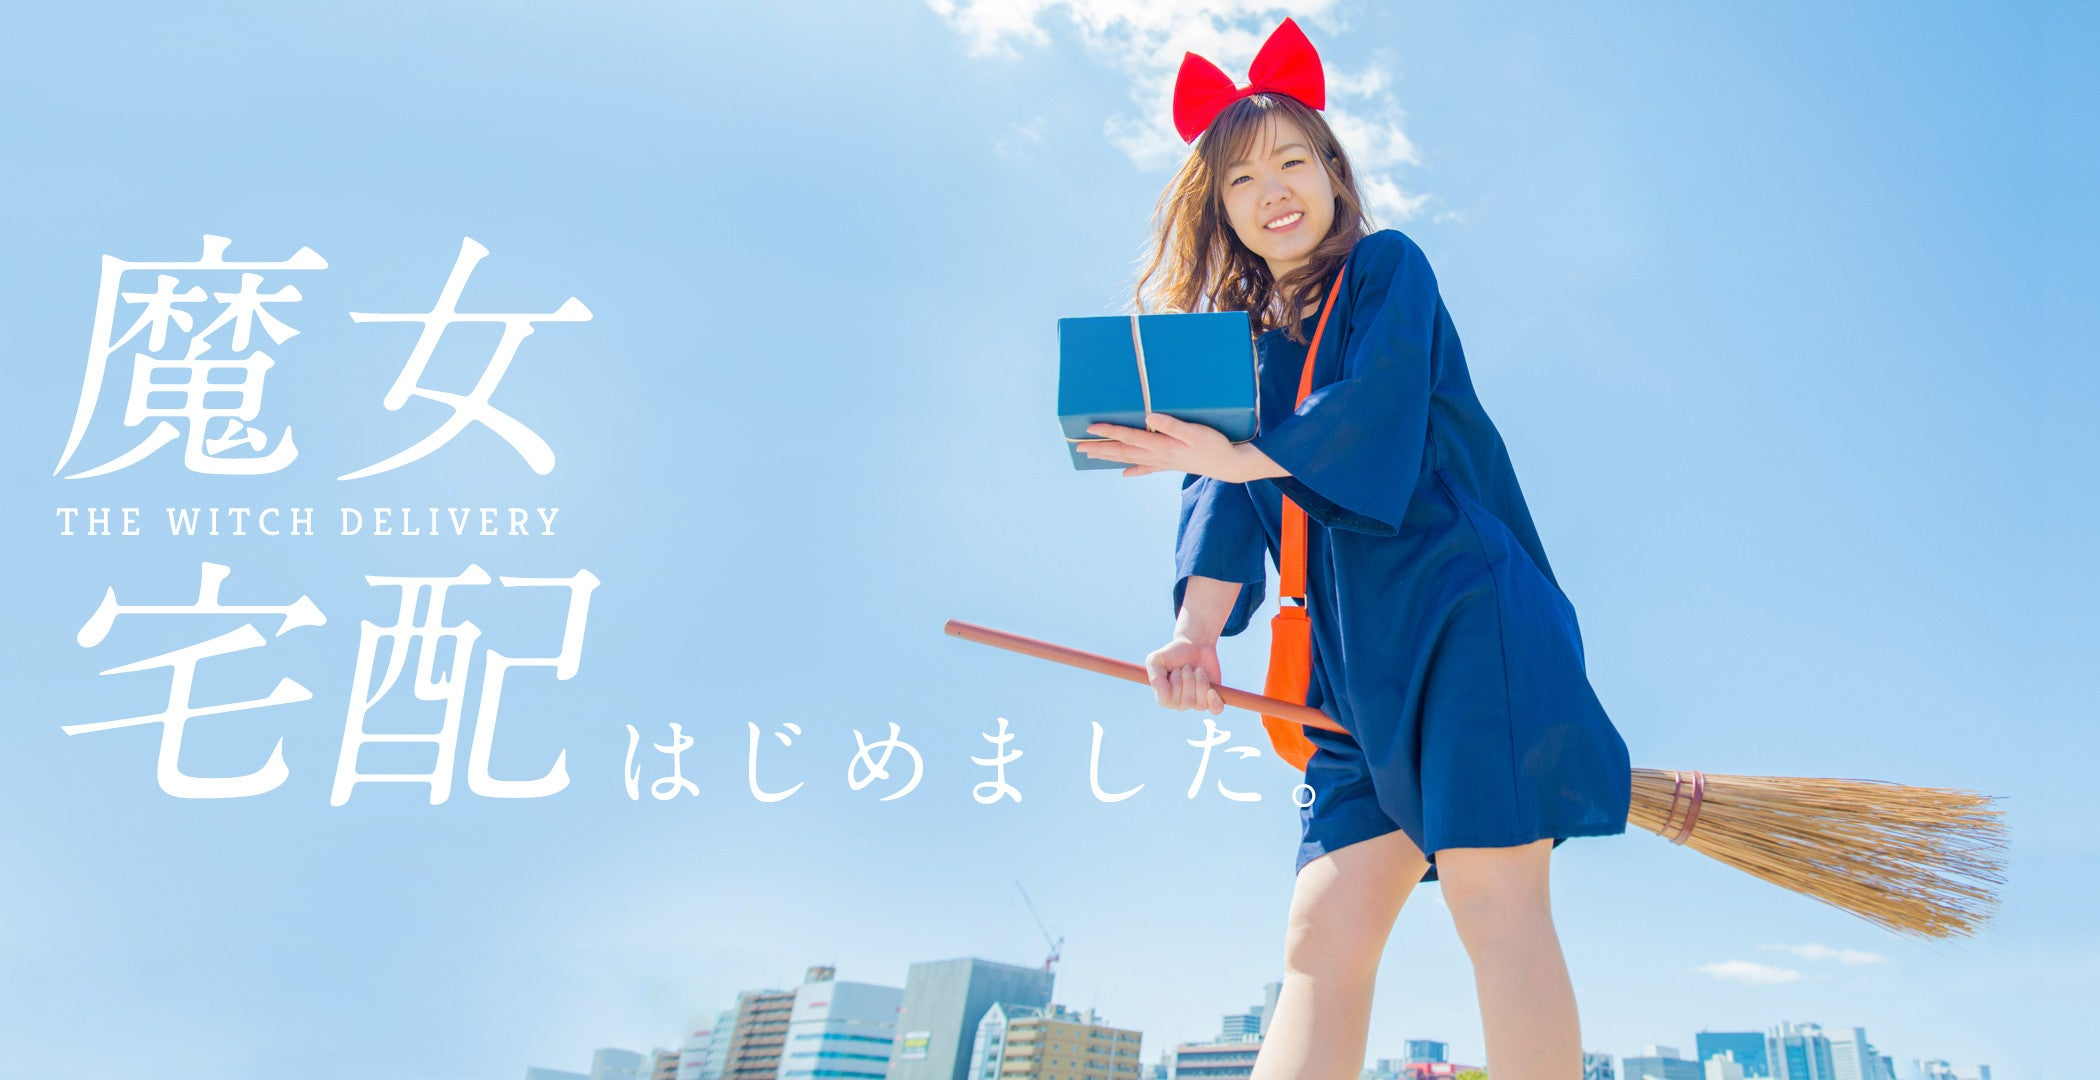 Japan's Best April Fools Jokes of 2016